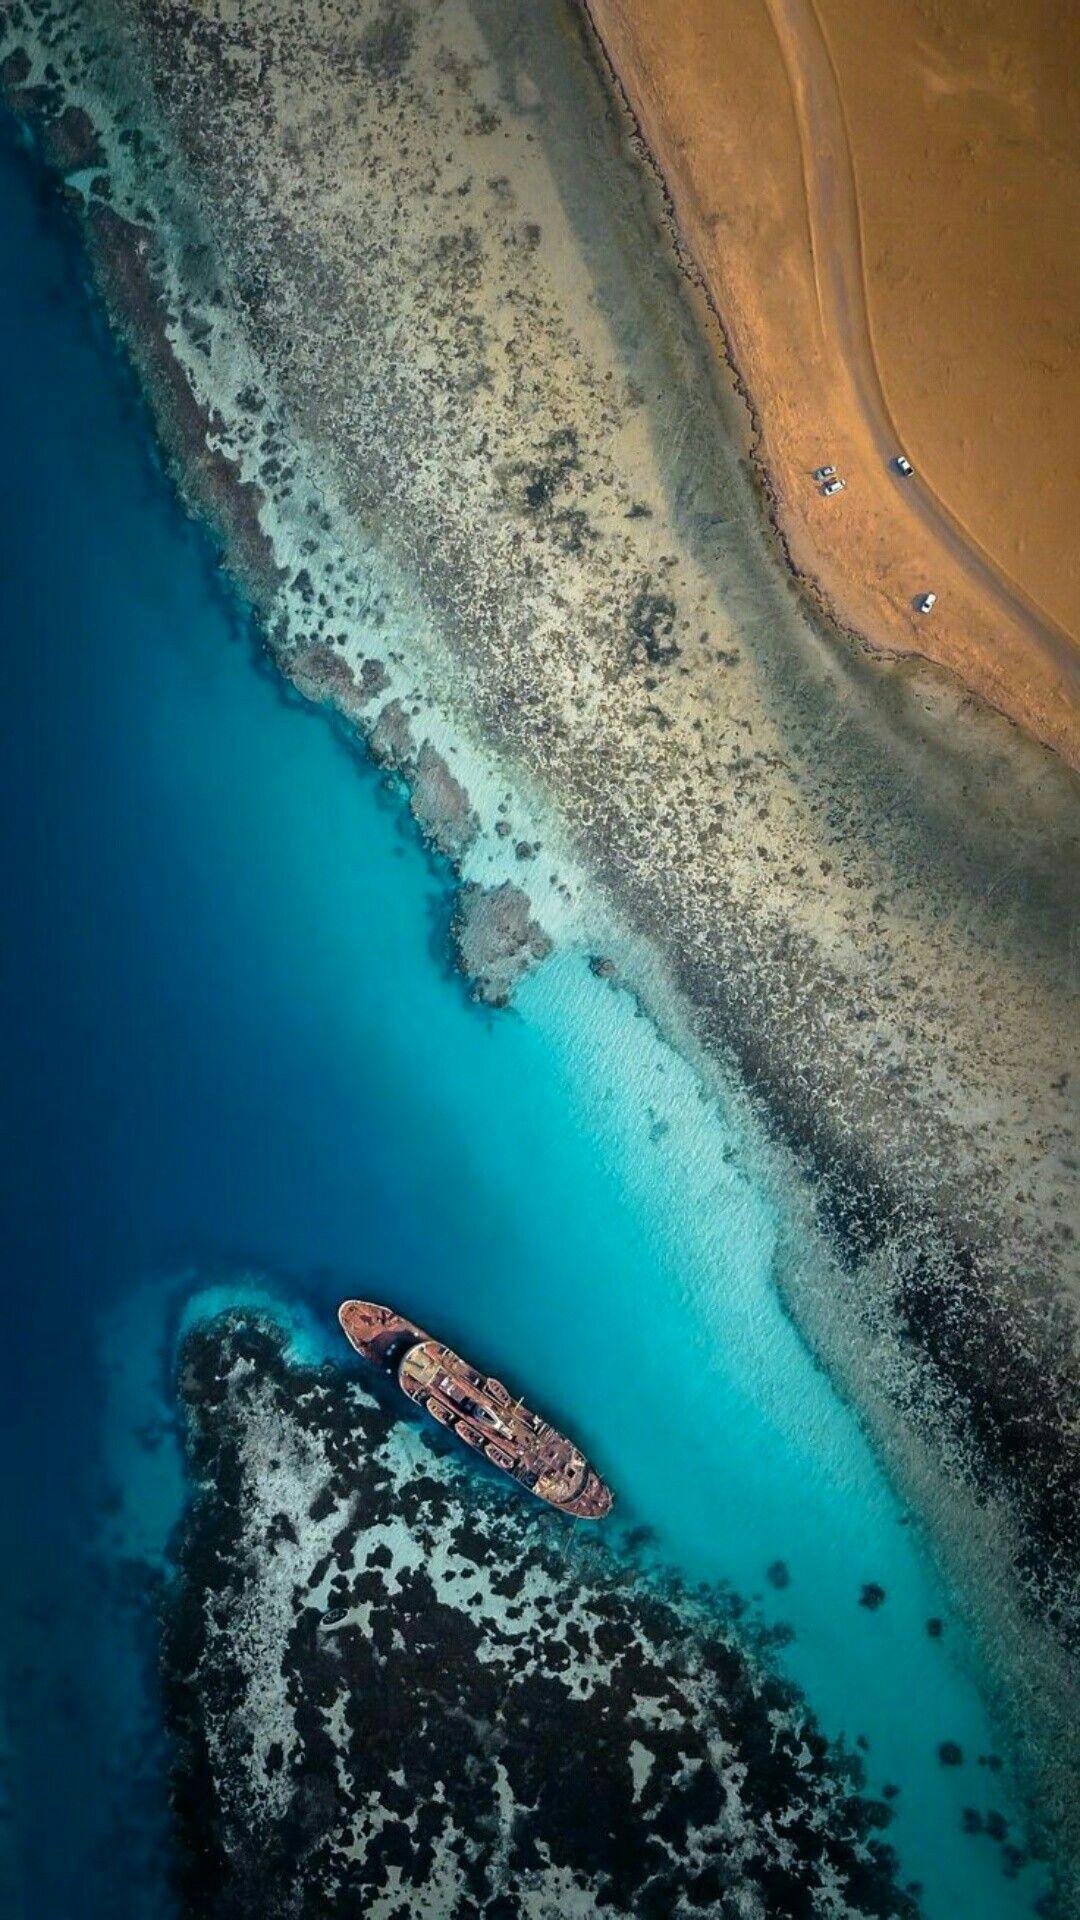 29+ 4k Drone View Beach Wallpapers on WallpaperSafari